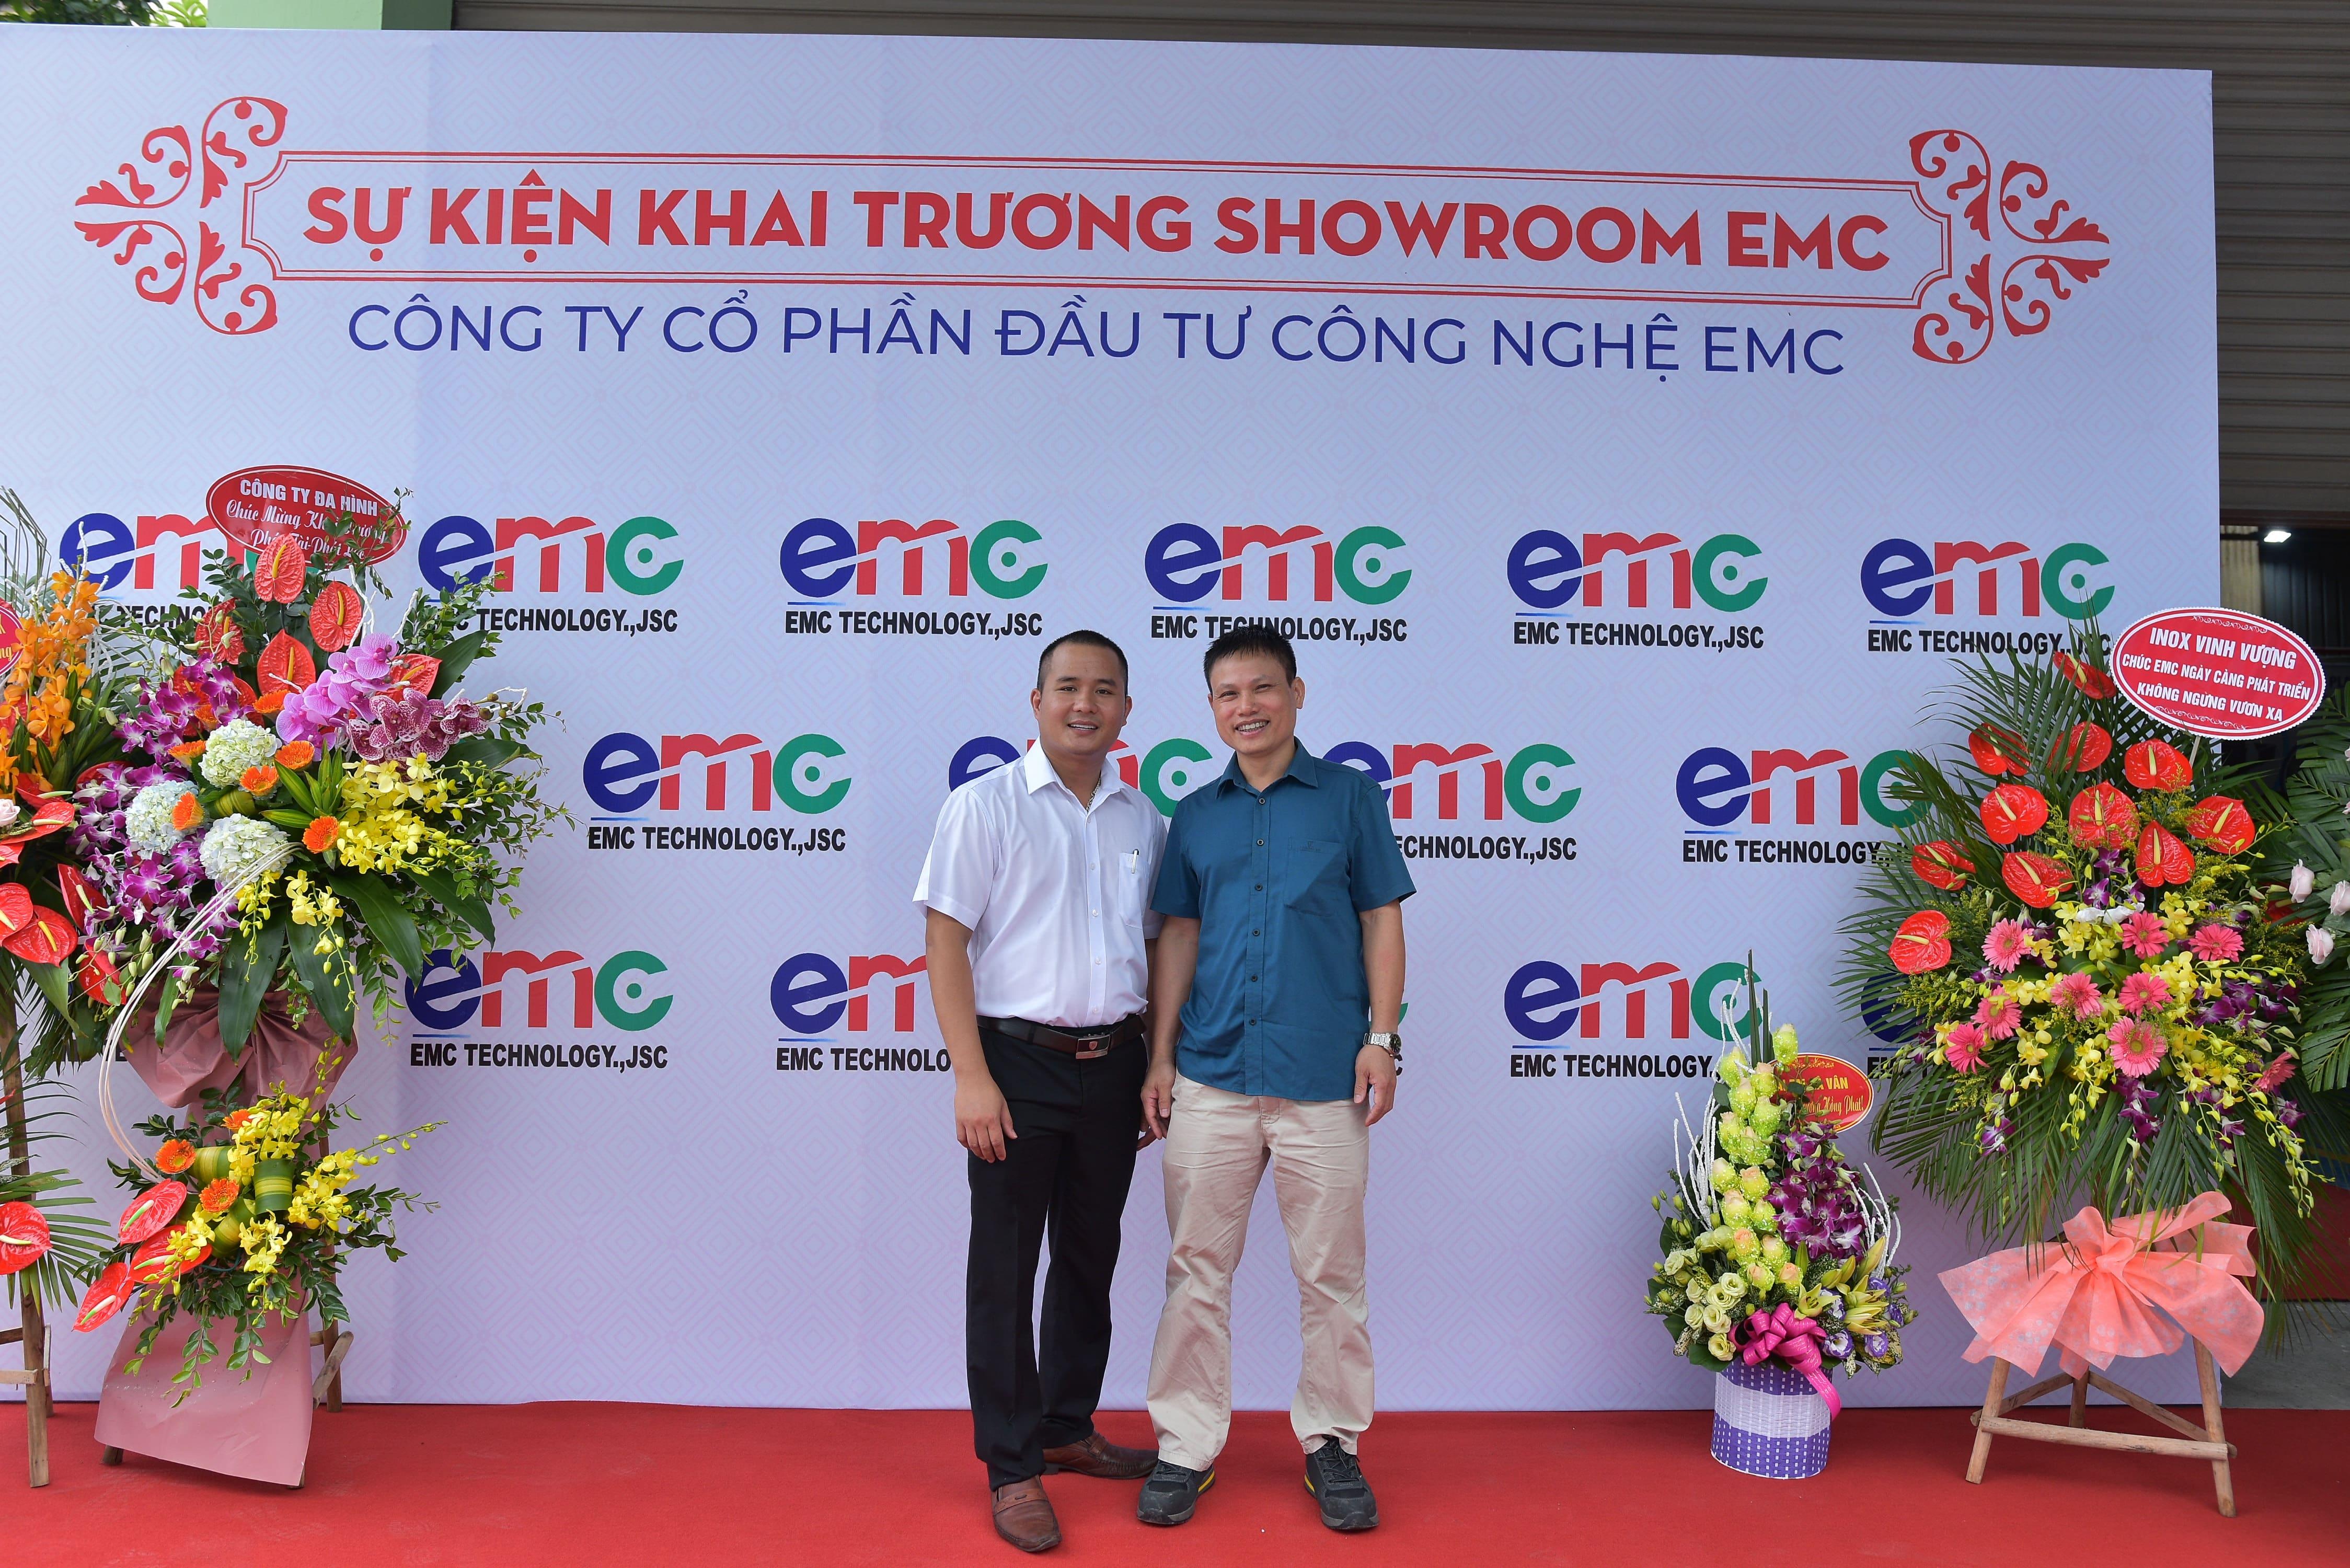 khach-hang-chup-anh-tai-buoi-khai-truong-showroom